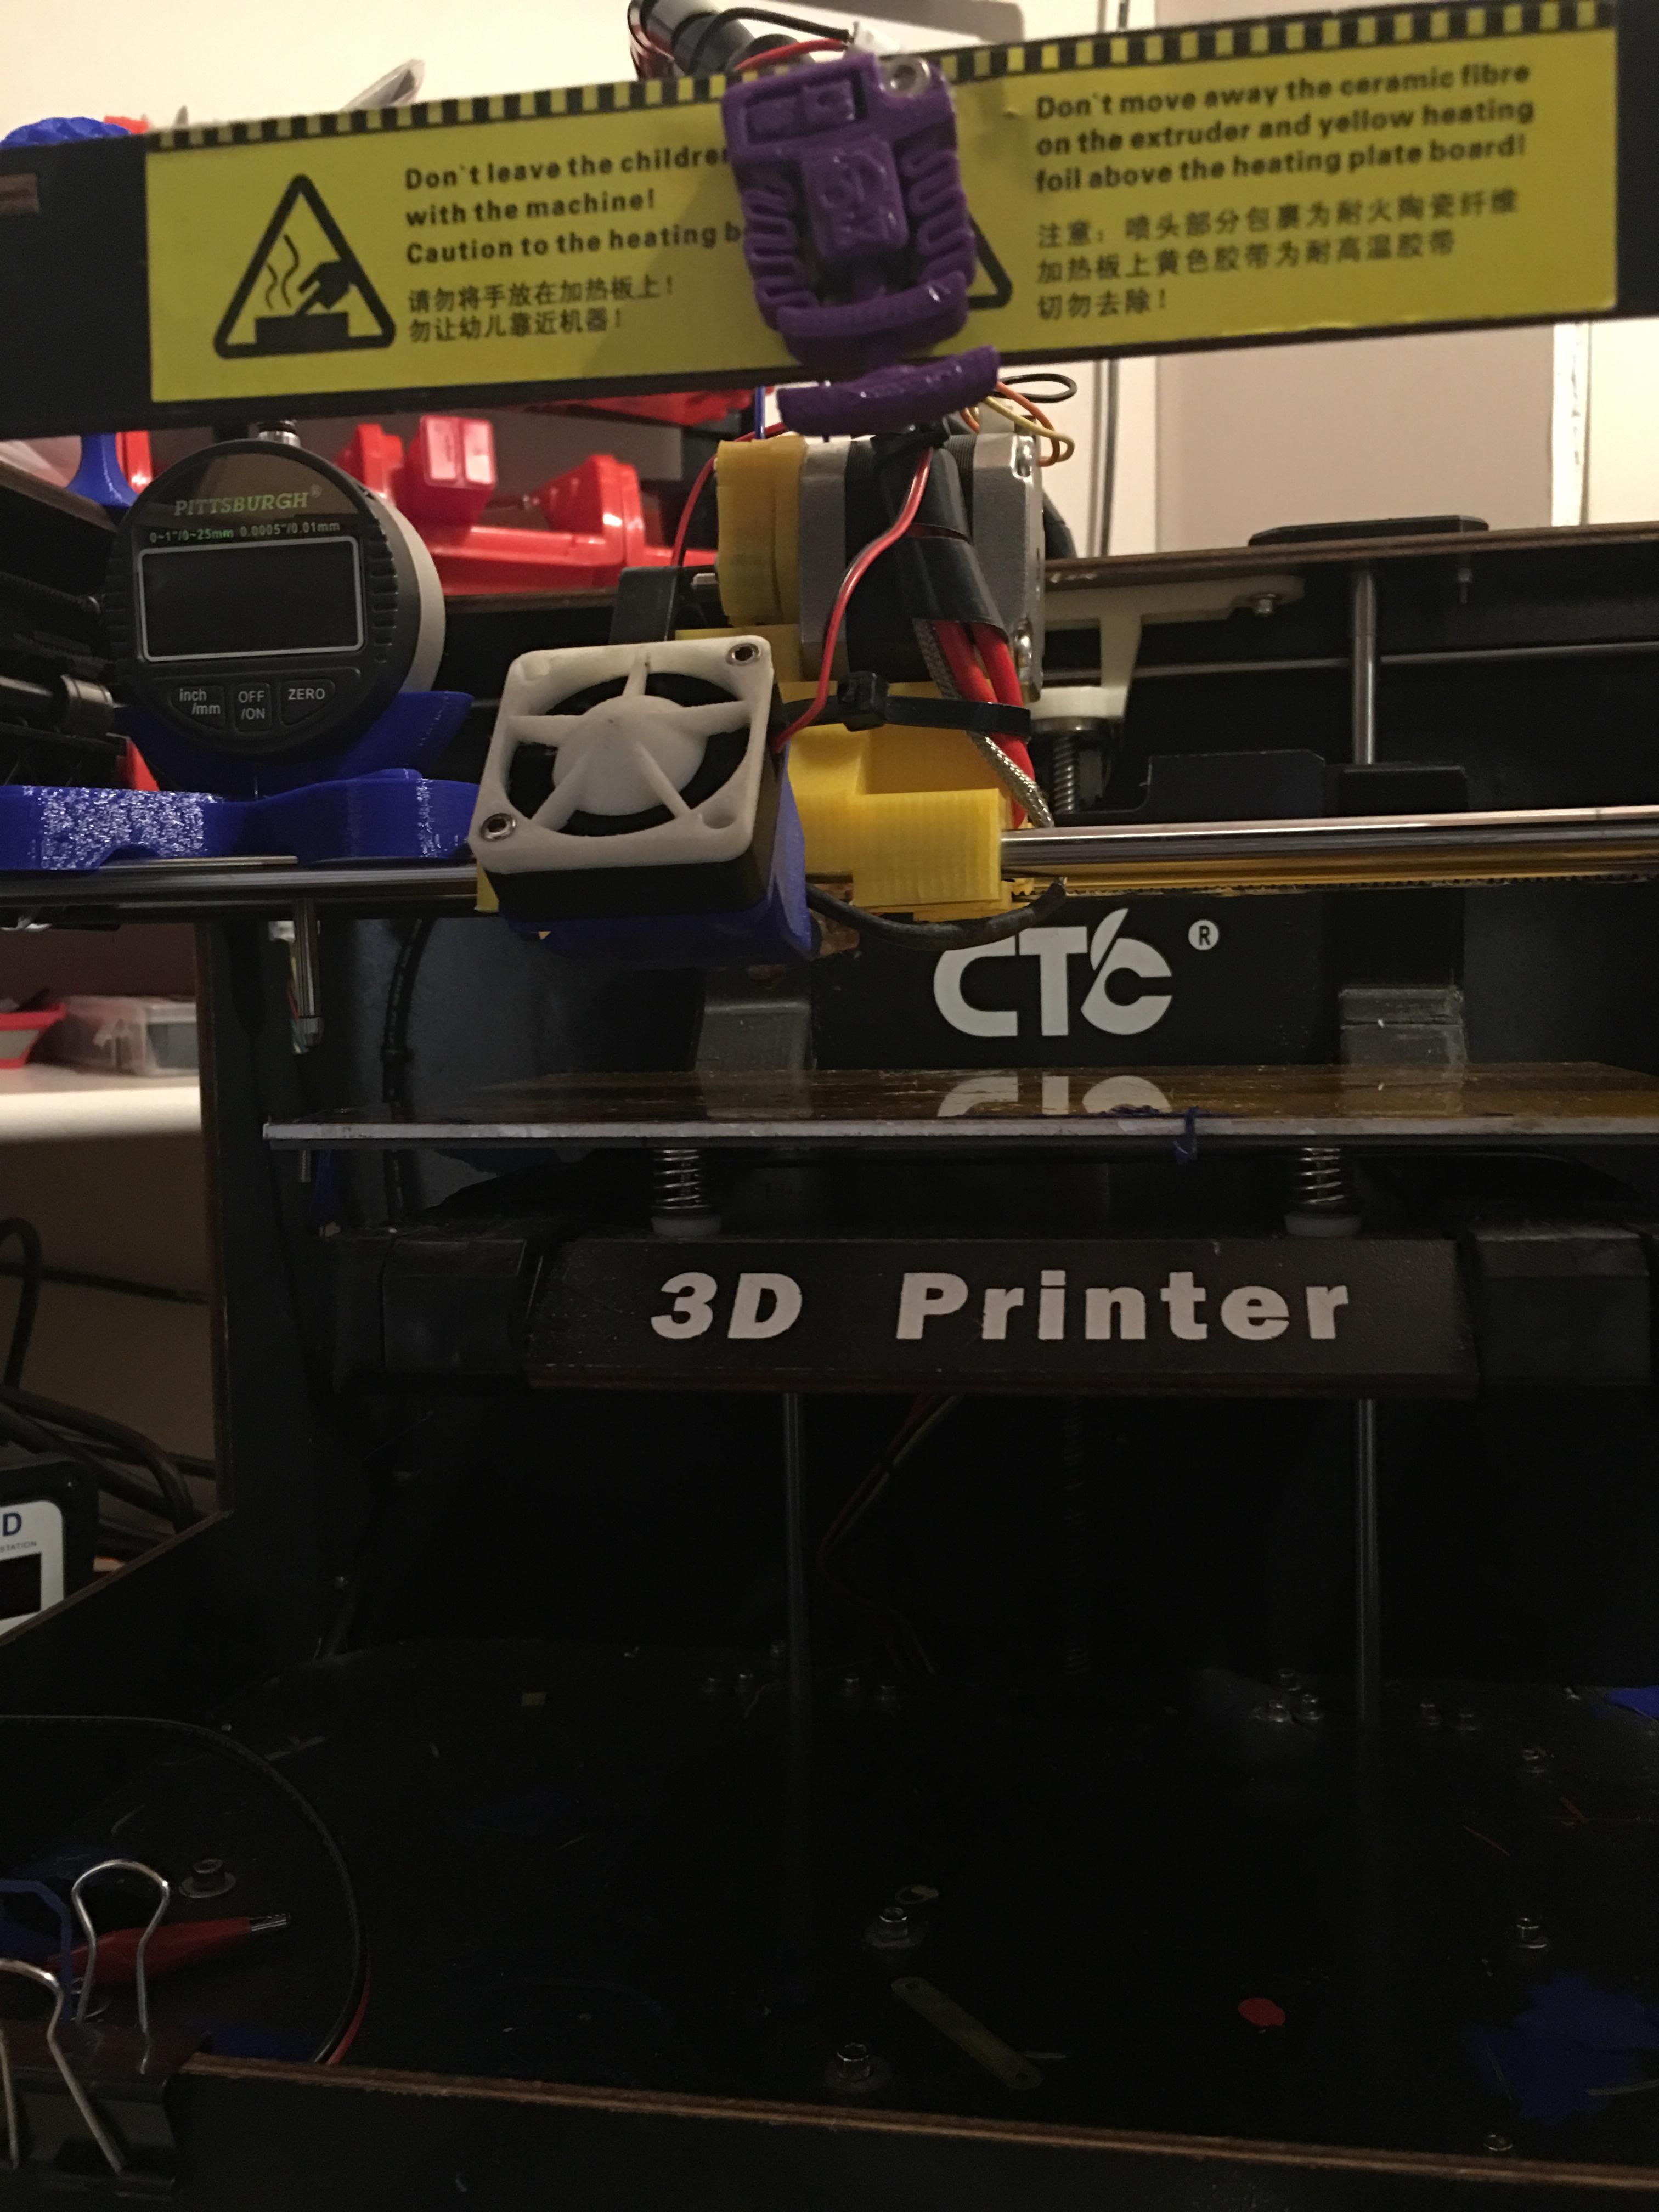 What CTC upgrades should i do_ - 3D Printing / 3D Printers - Talk